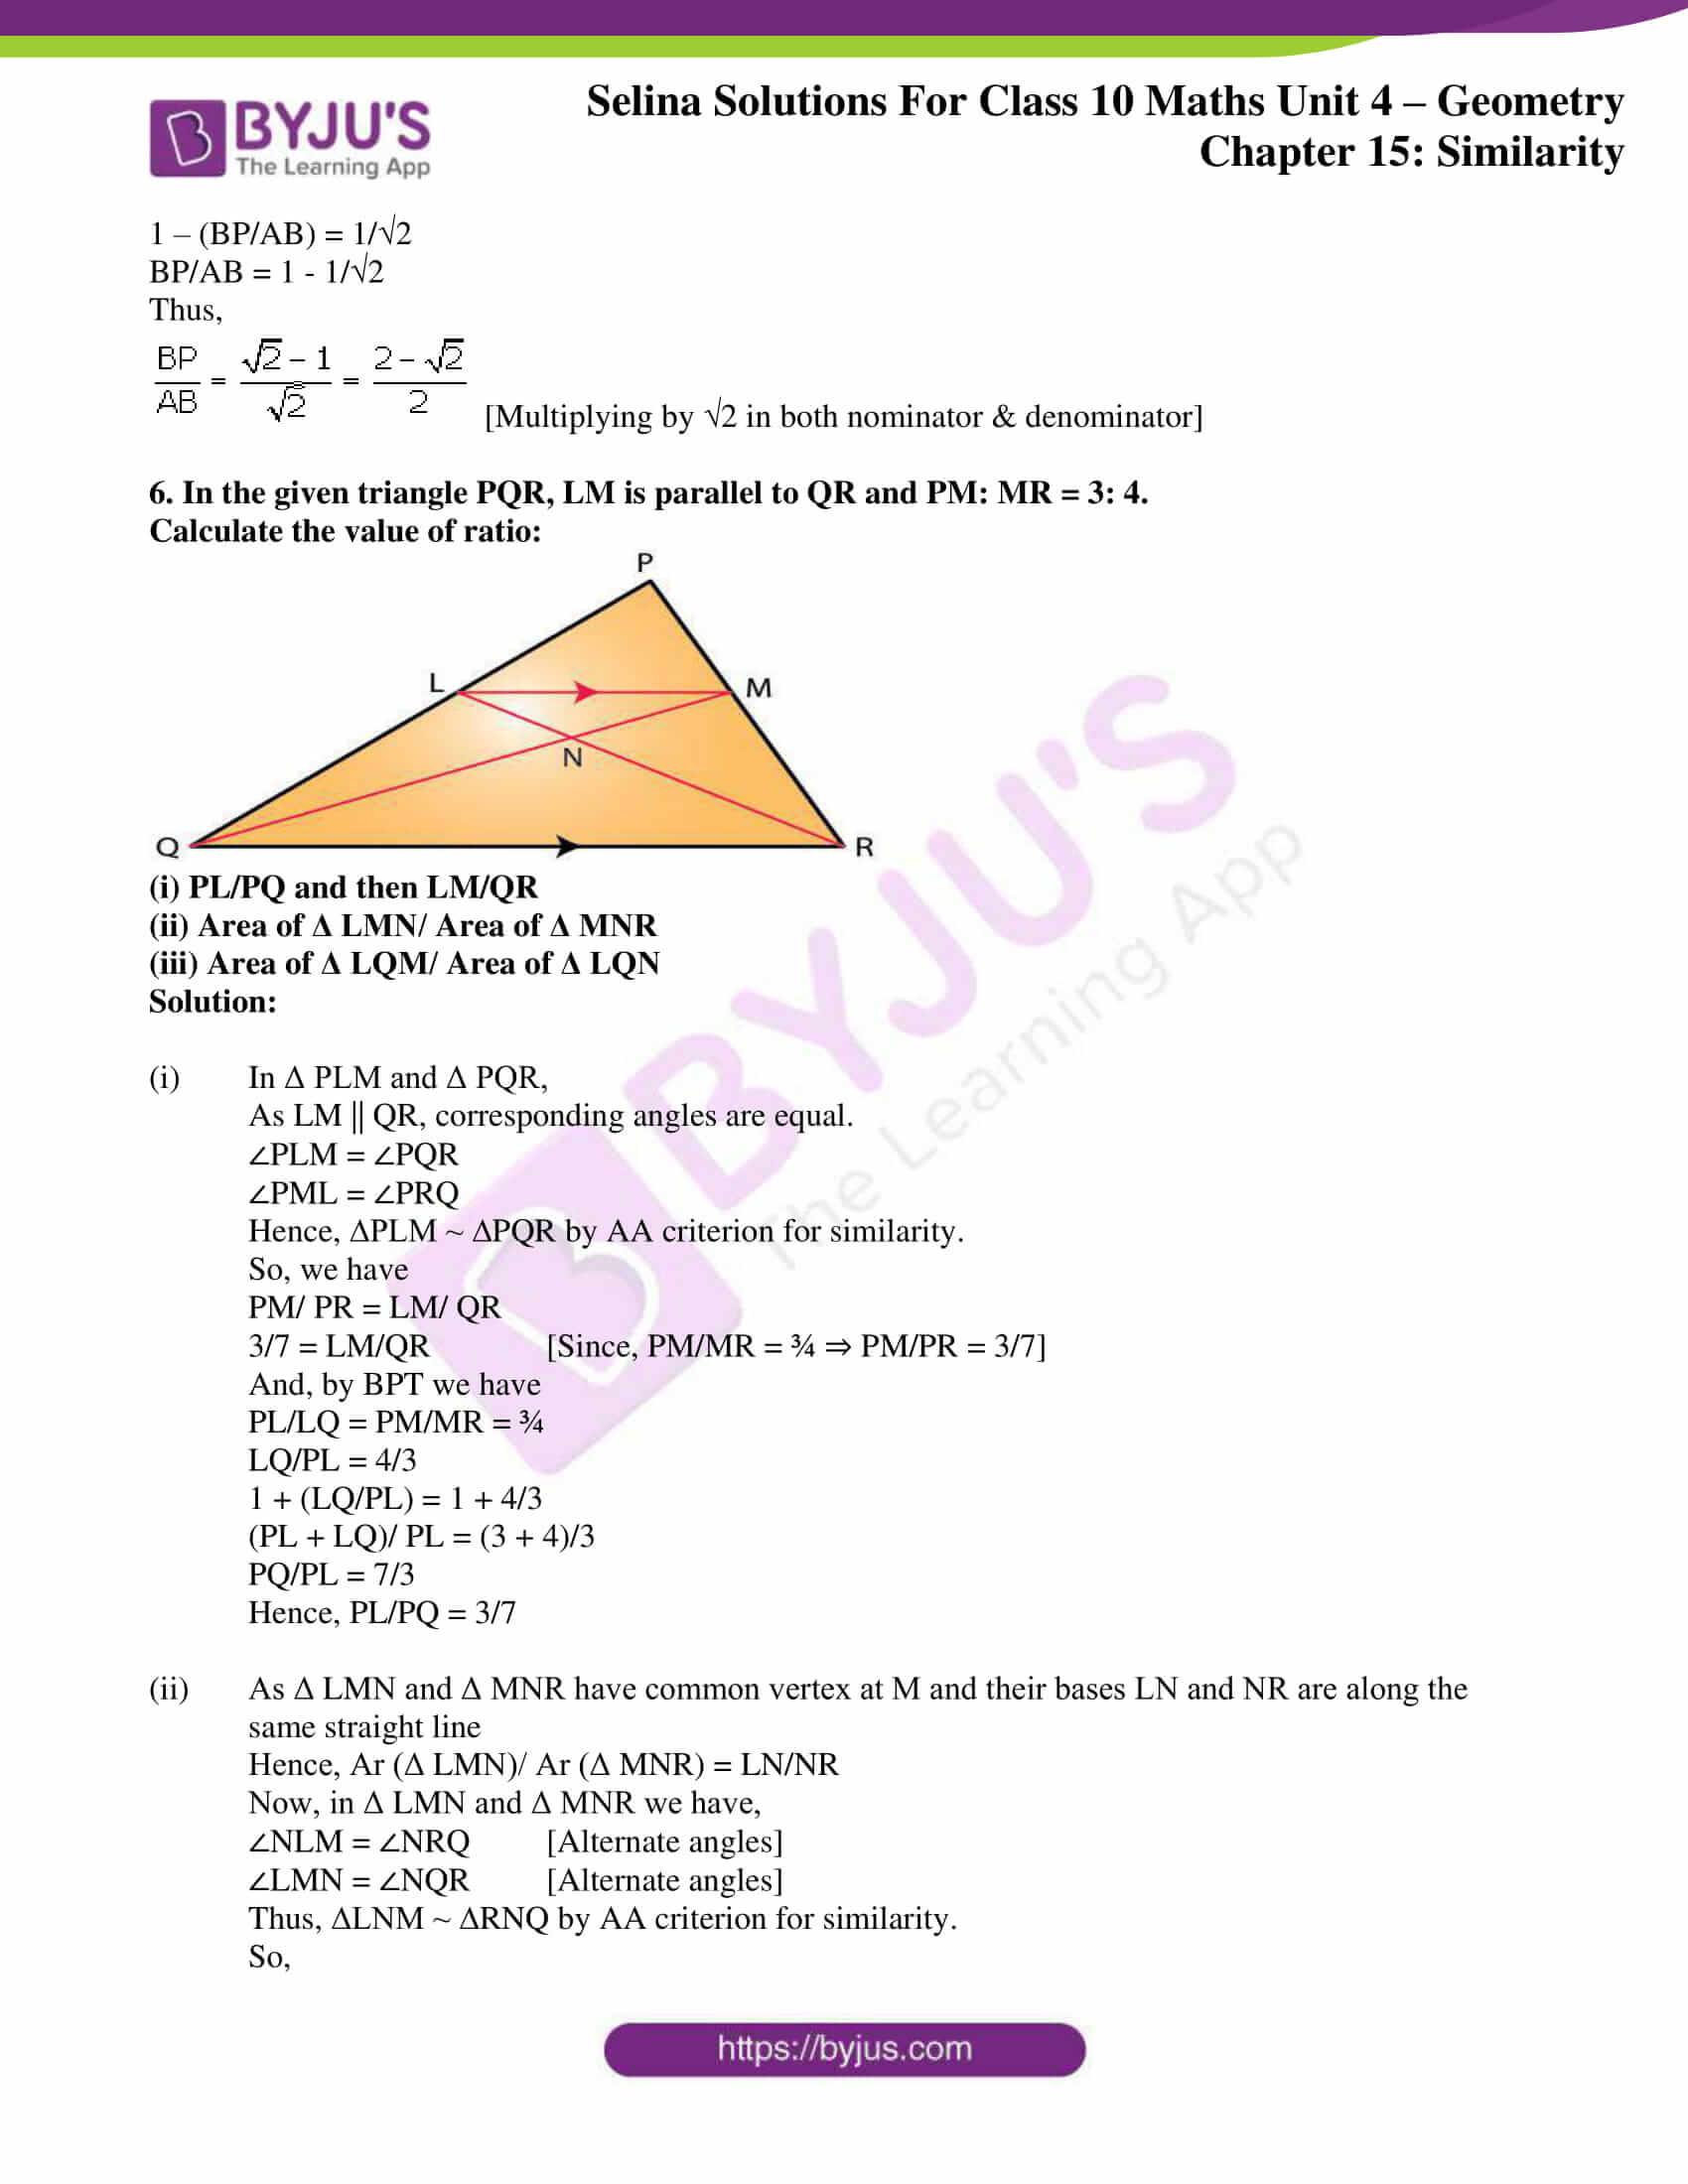 selina-sol-maths-class-10-ch-15-ex-c-3